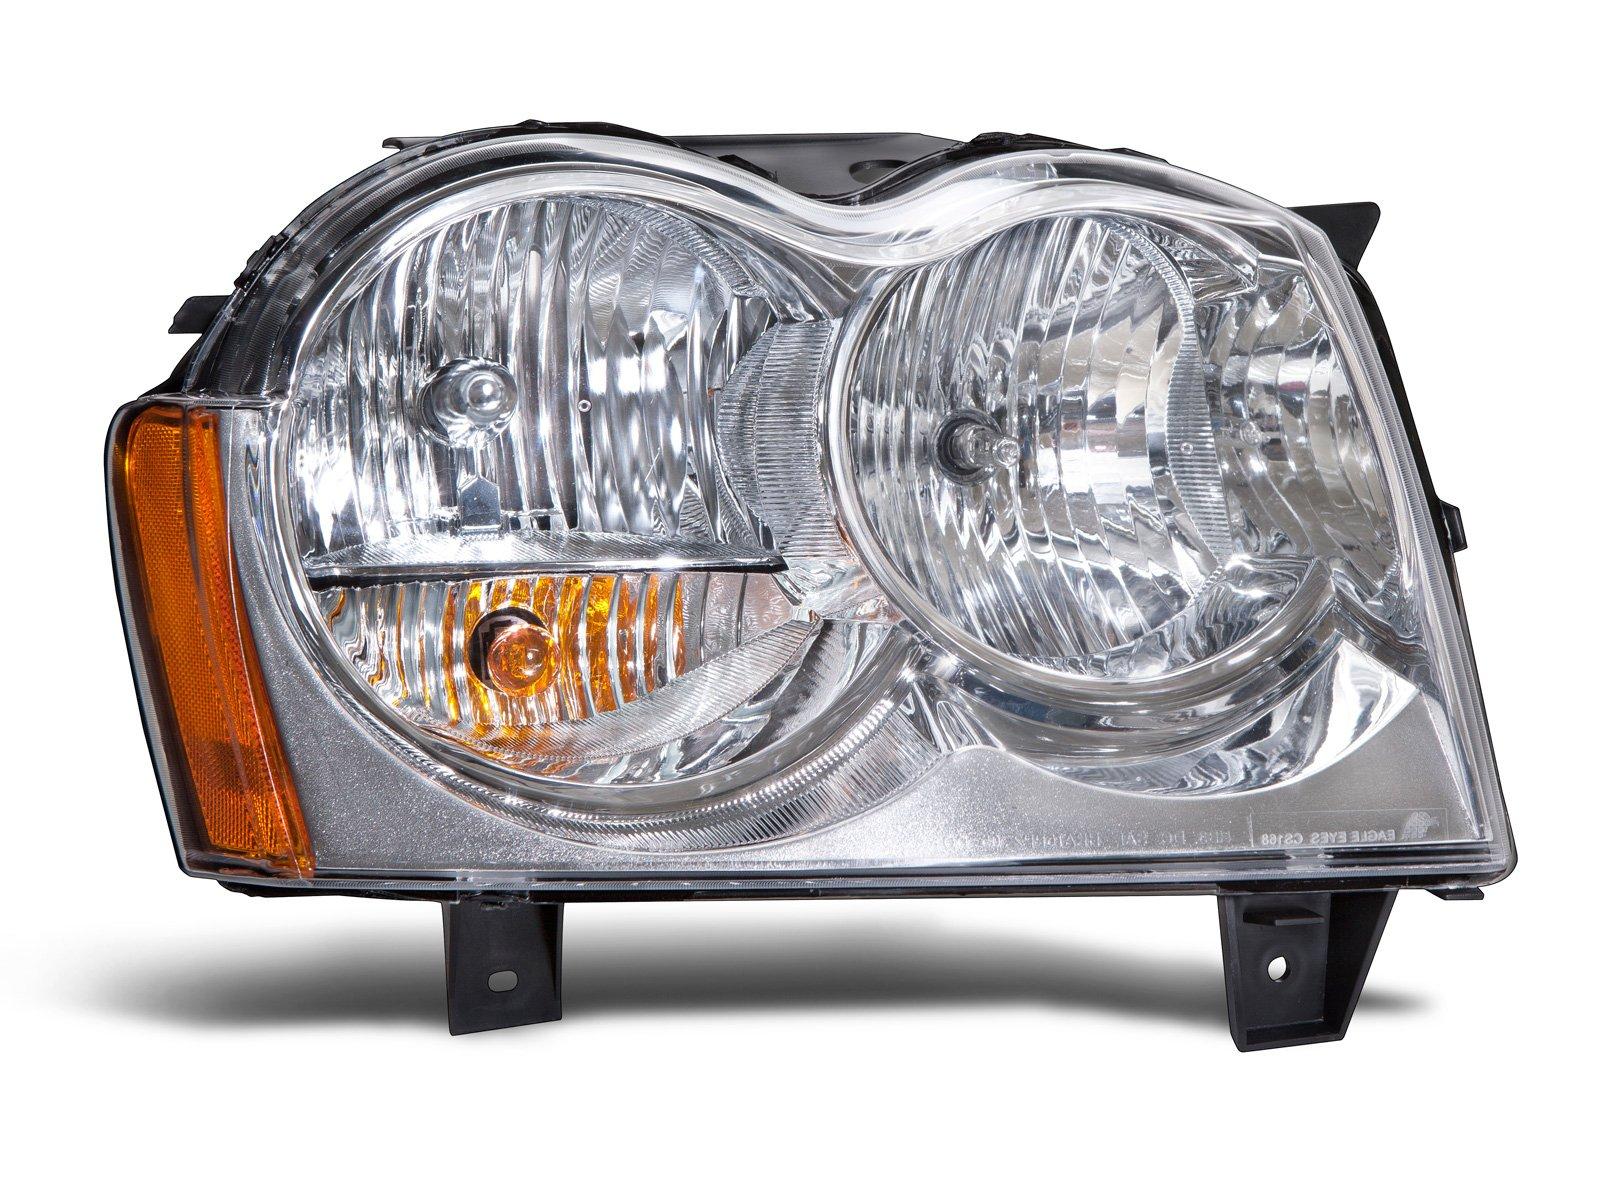 HEADLIGHTSDEPOT Chrome Housing Halogen Headlight Compatible with Jeep Grand Cherokee 2005-2007 Includes Right Passenger Side Headlamp